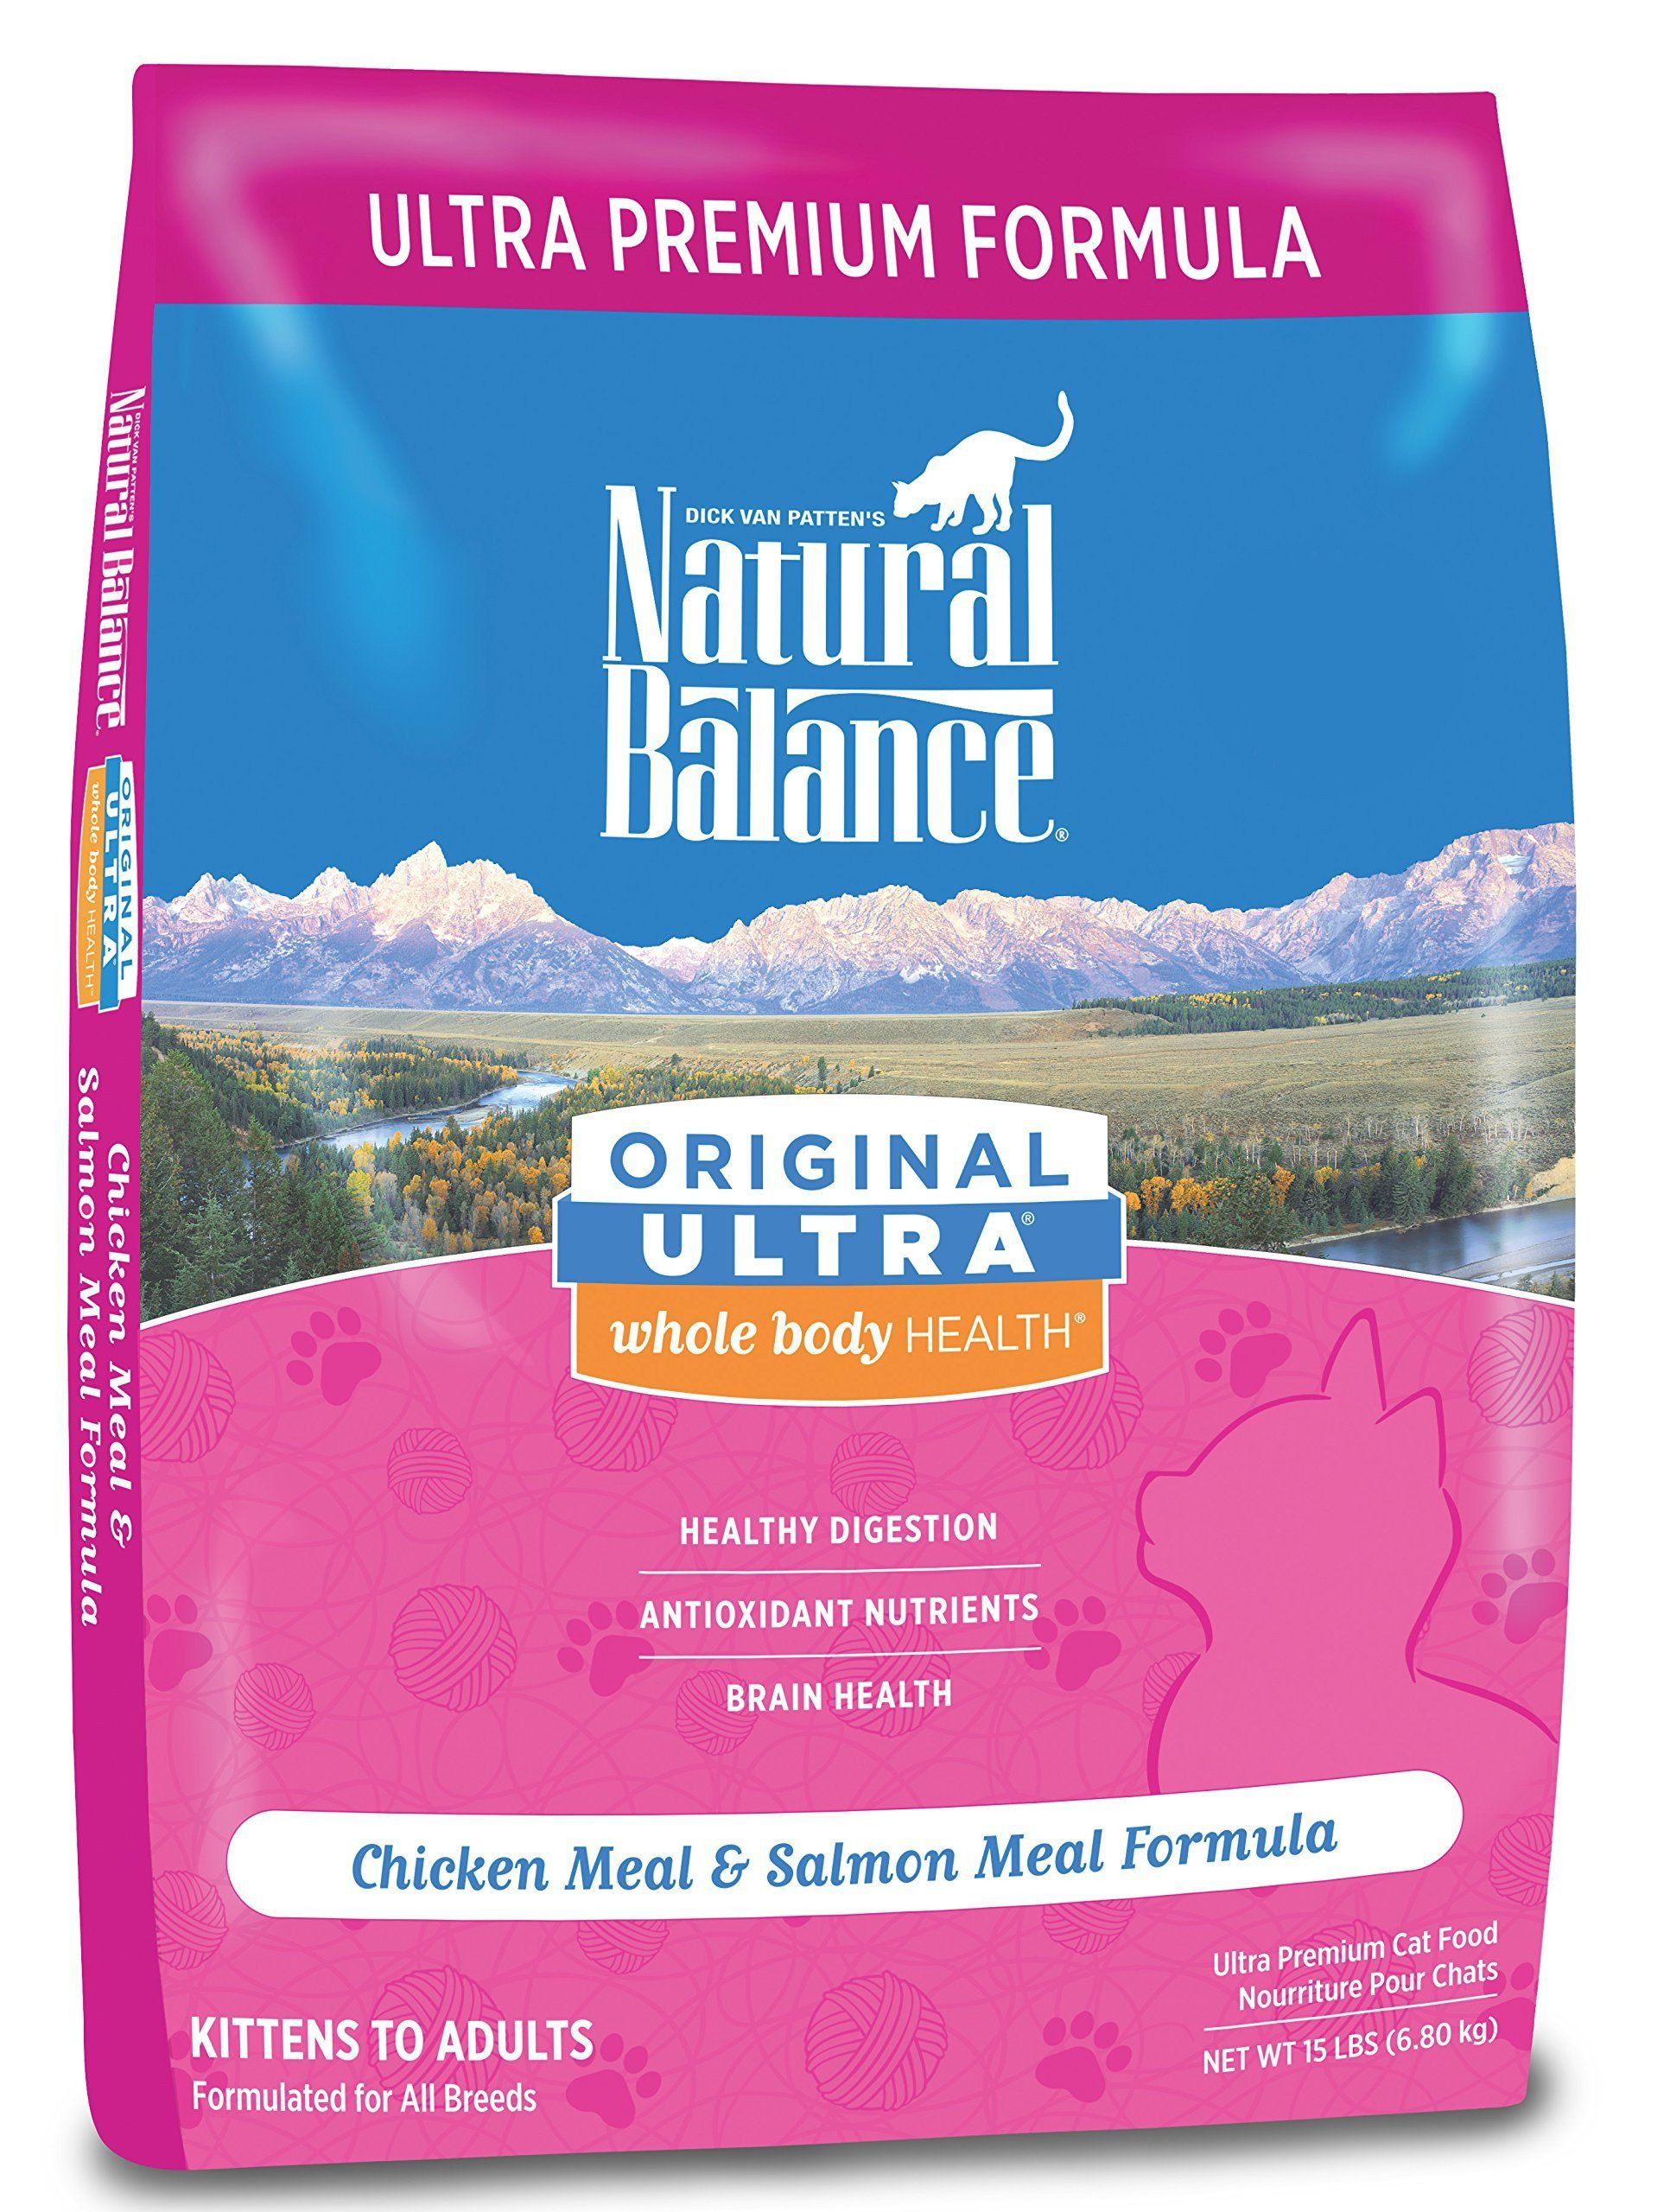 Natural Balance Original Ultra Whole Body Health Dry Cat